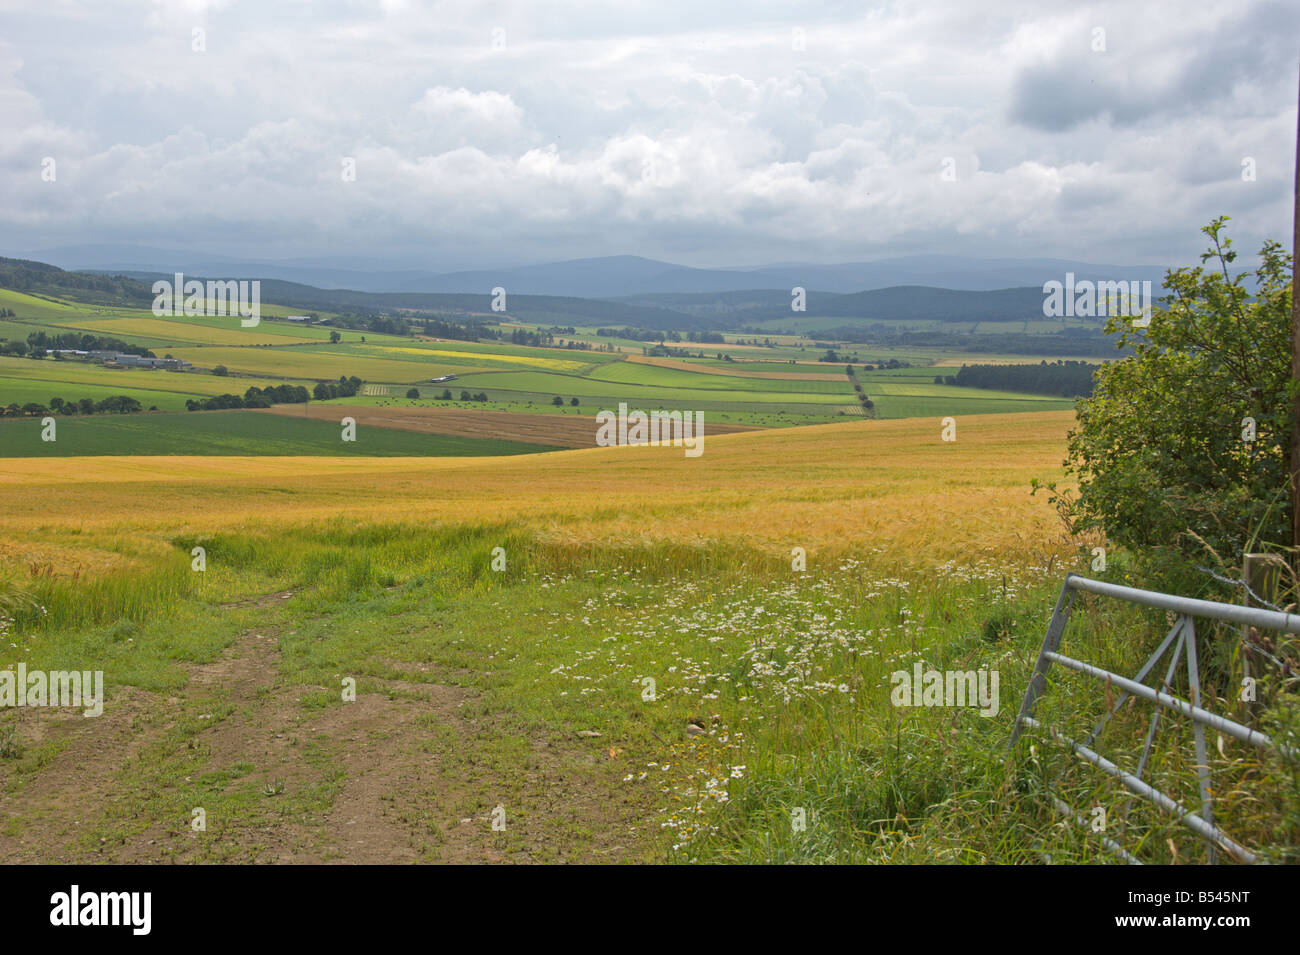 Queen s Victoria View Slack of Tillylodge Deeside Grampians Aberdeenshire Highland Region Scotland August 2008 - Stock Image